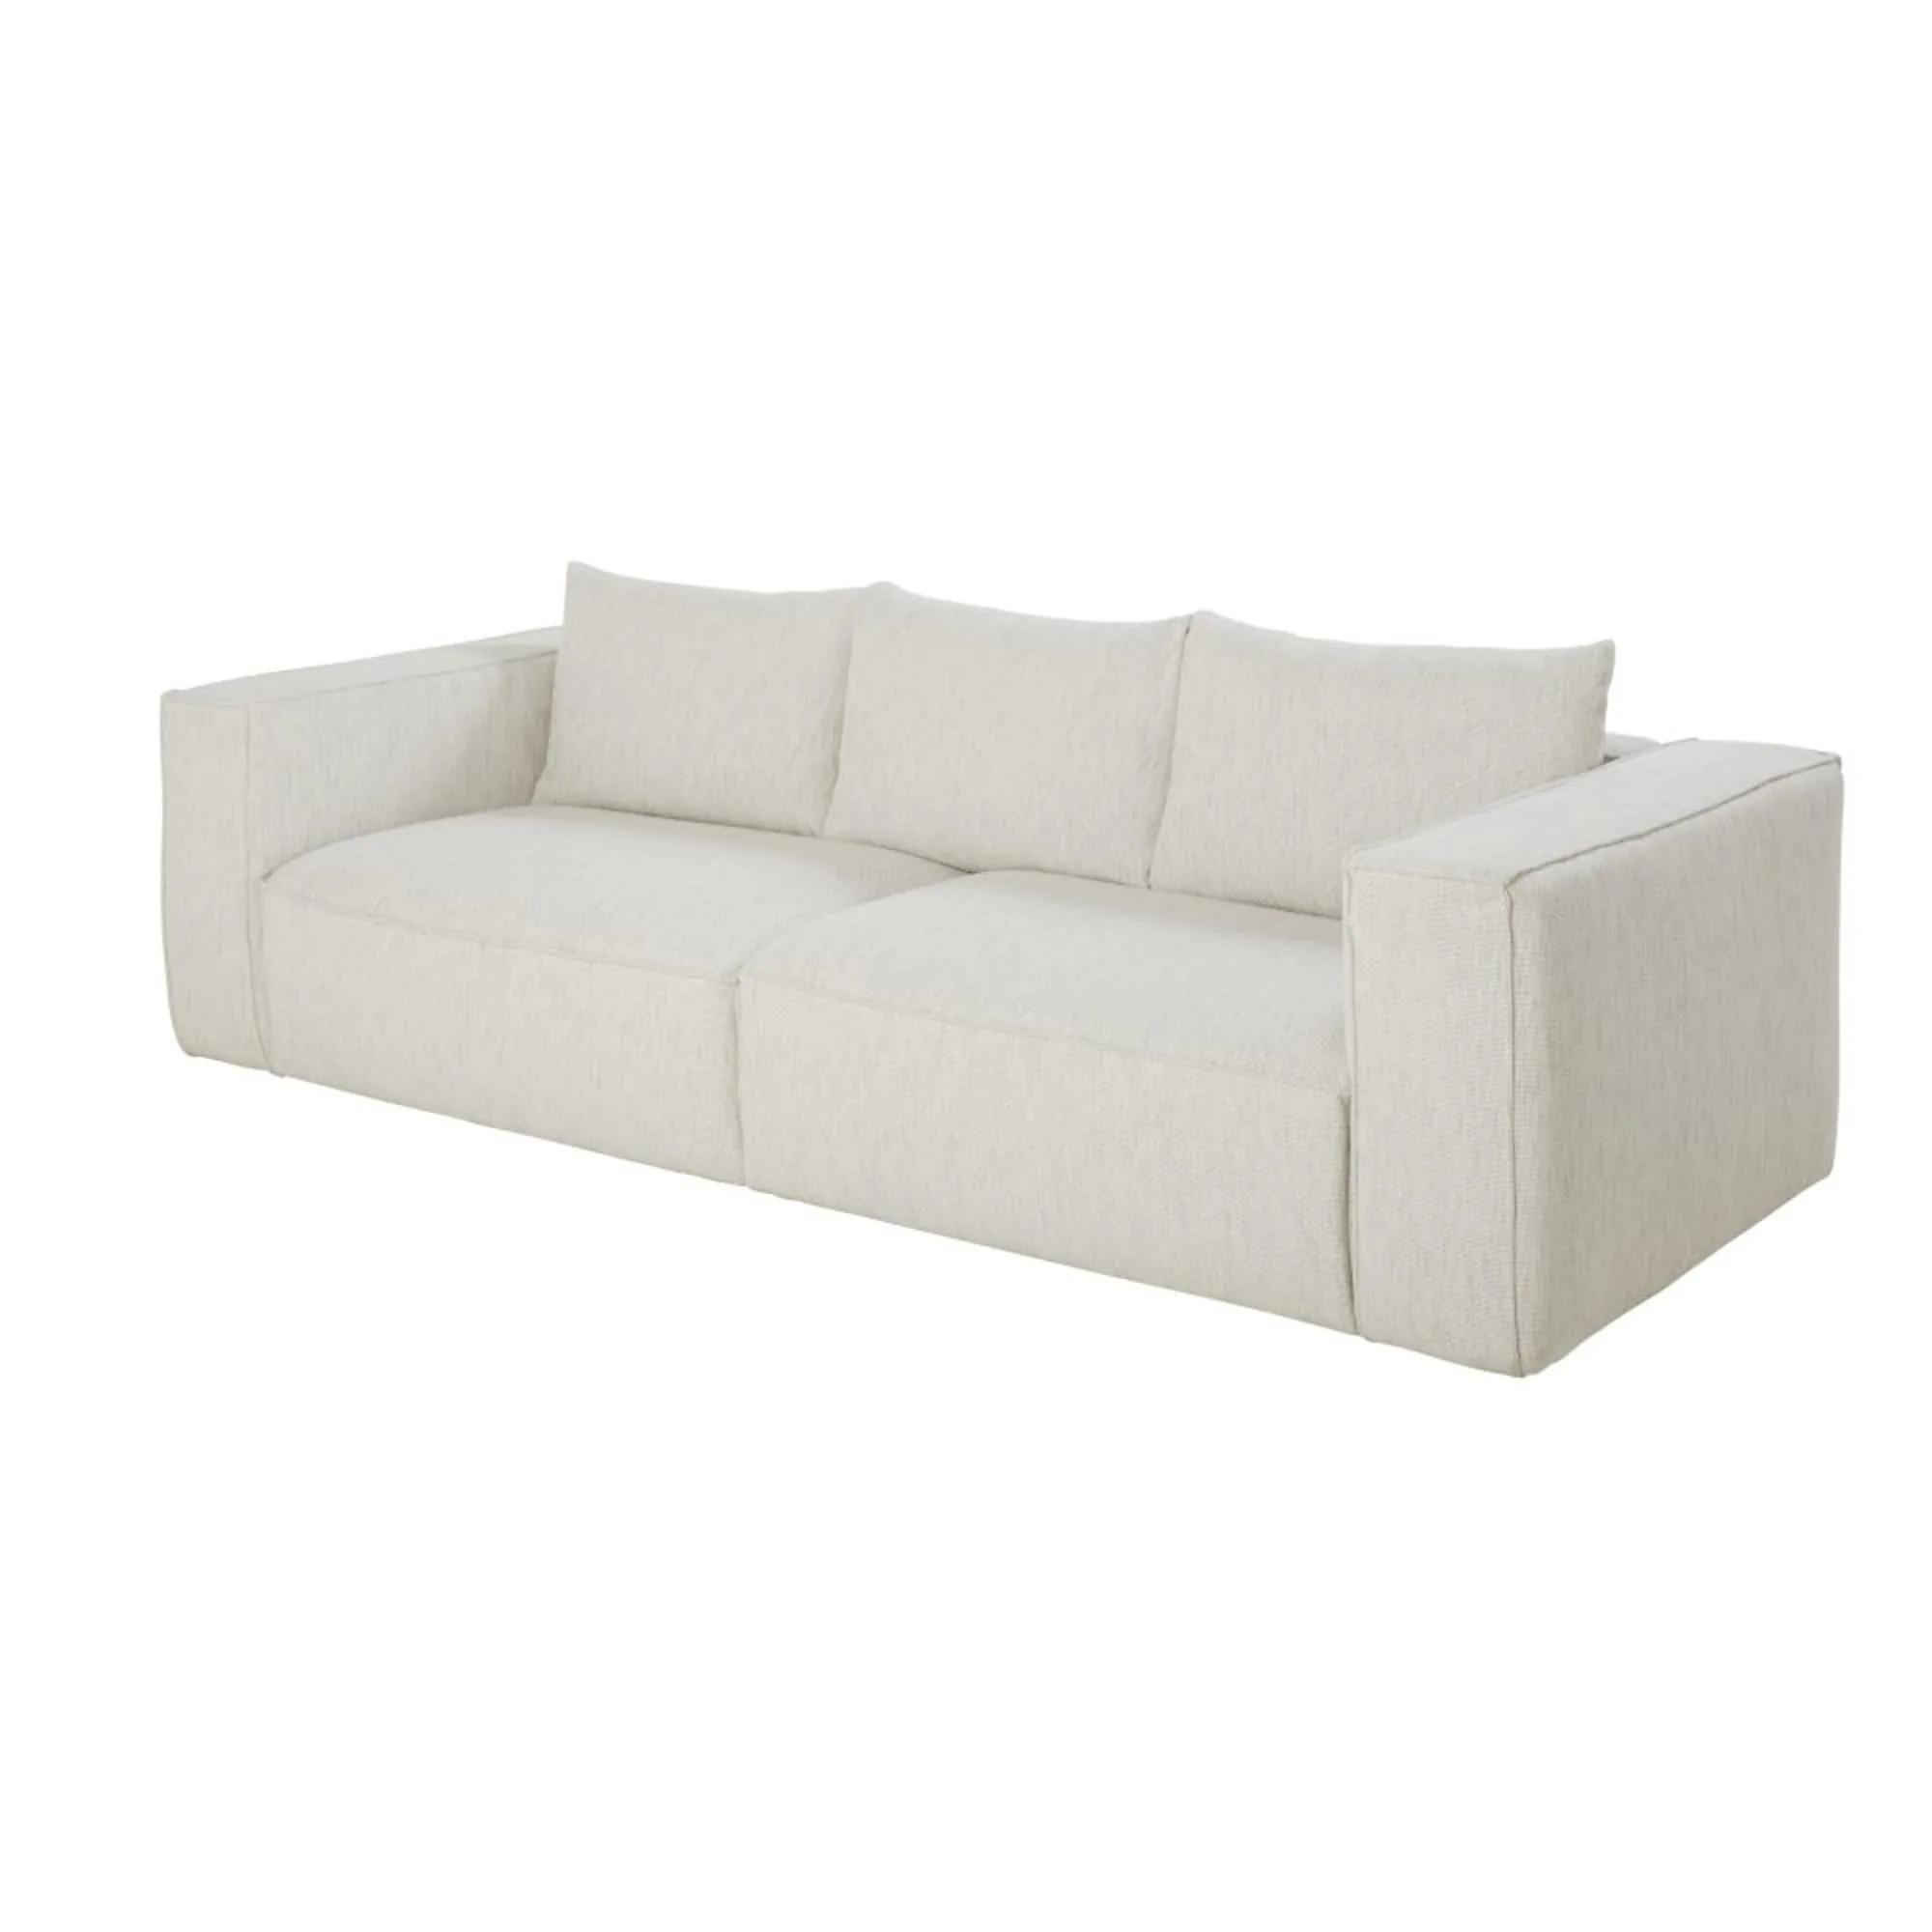 FALKOR- Sofá de 3 plazas ecodiseñado gris claro jaspeado